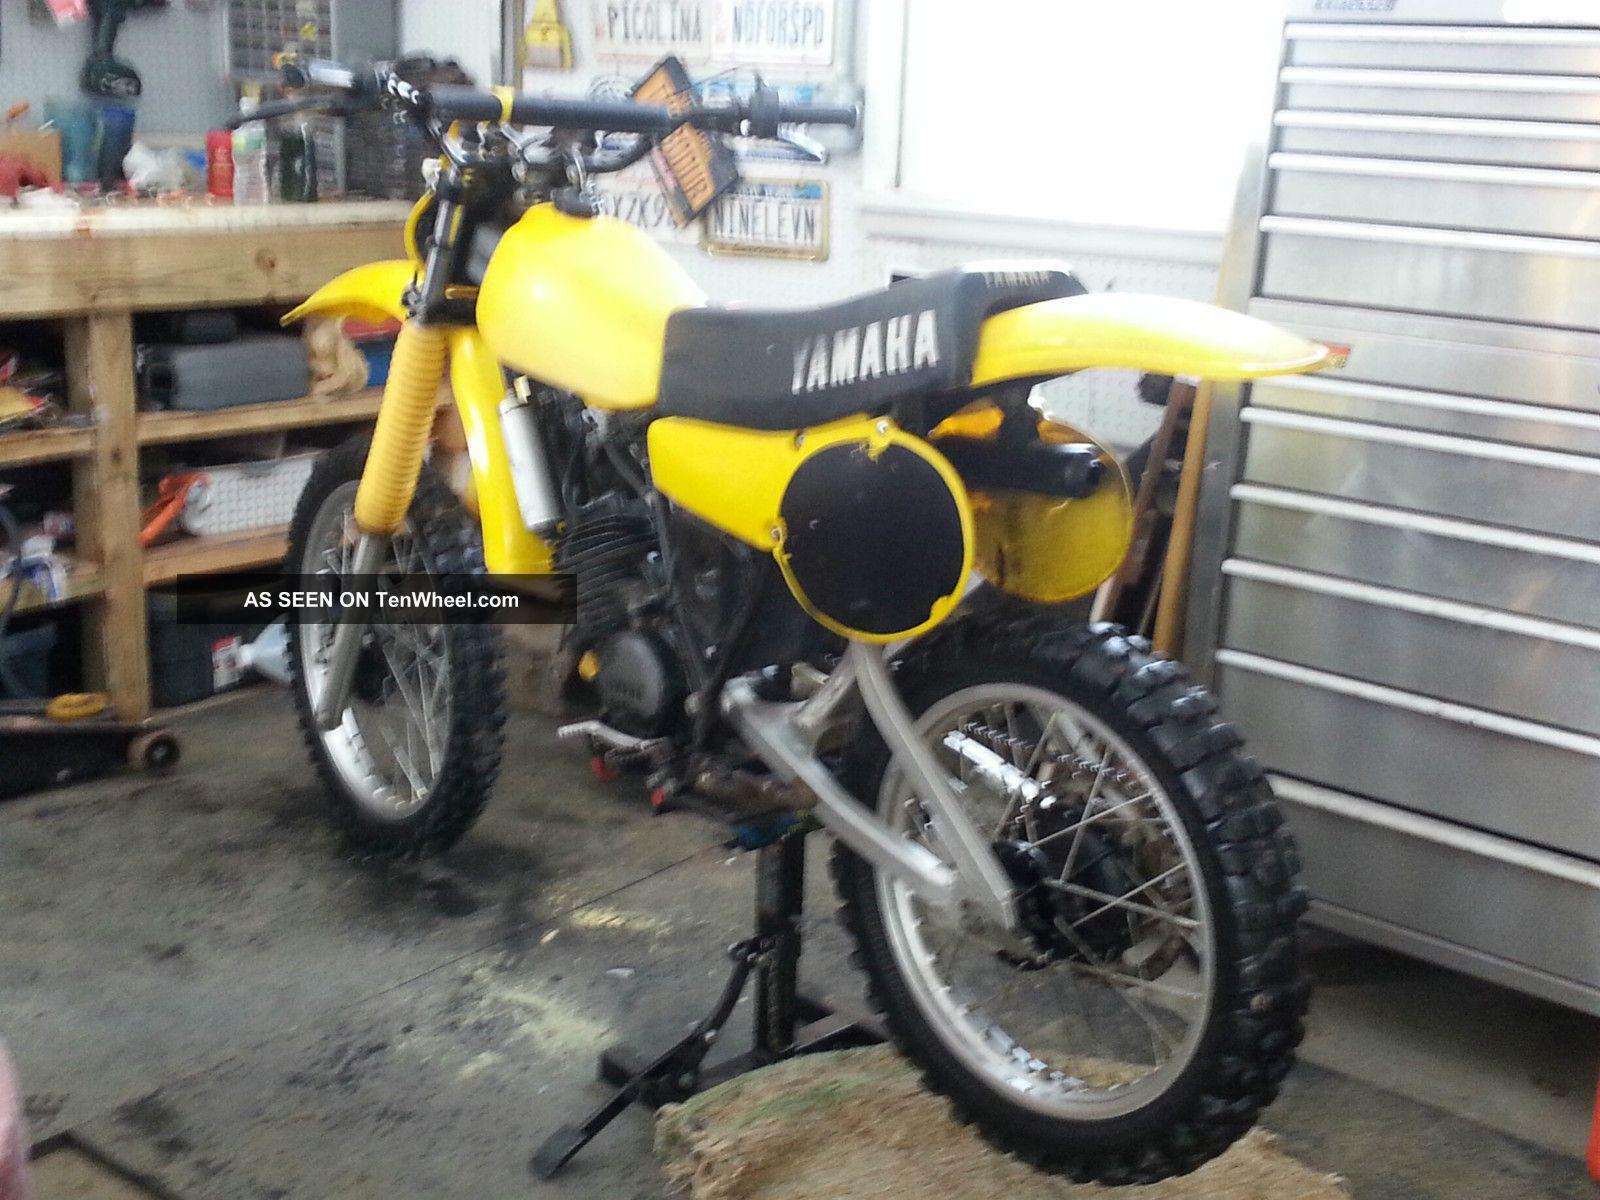 ... Yamaha Yz125 1980 Vintage Motocross YZ photo 2 ...